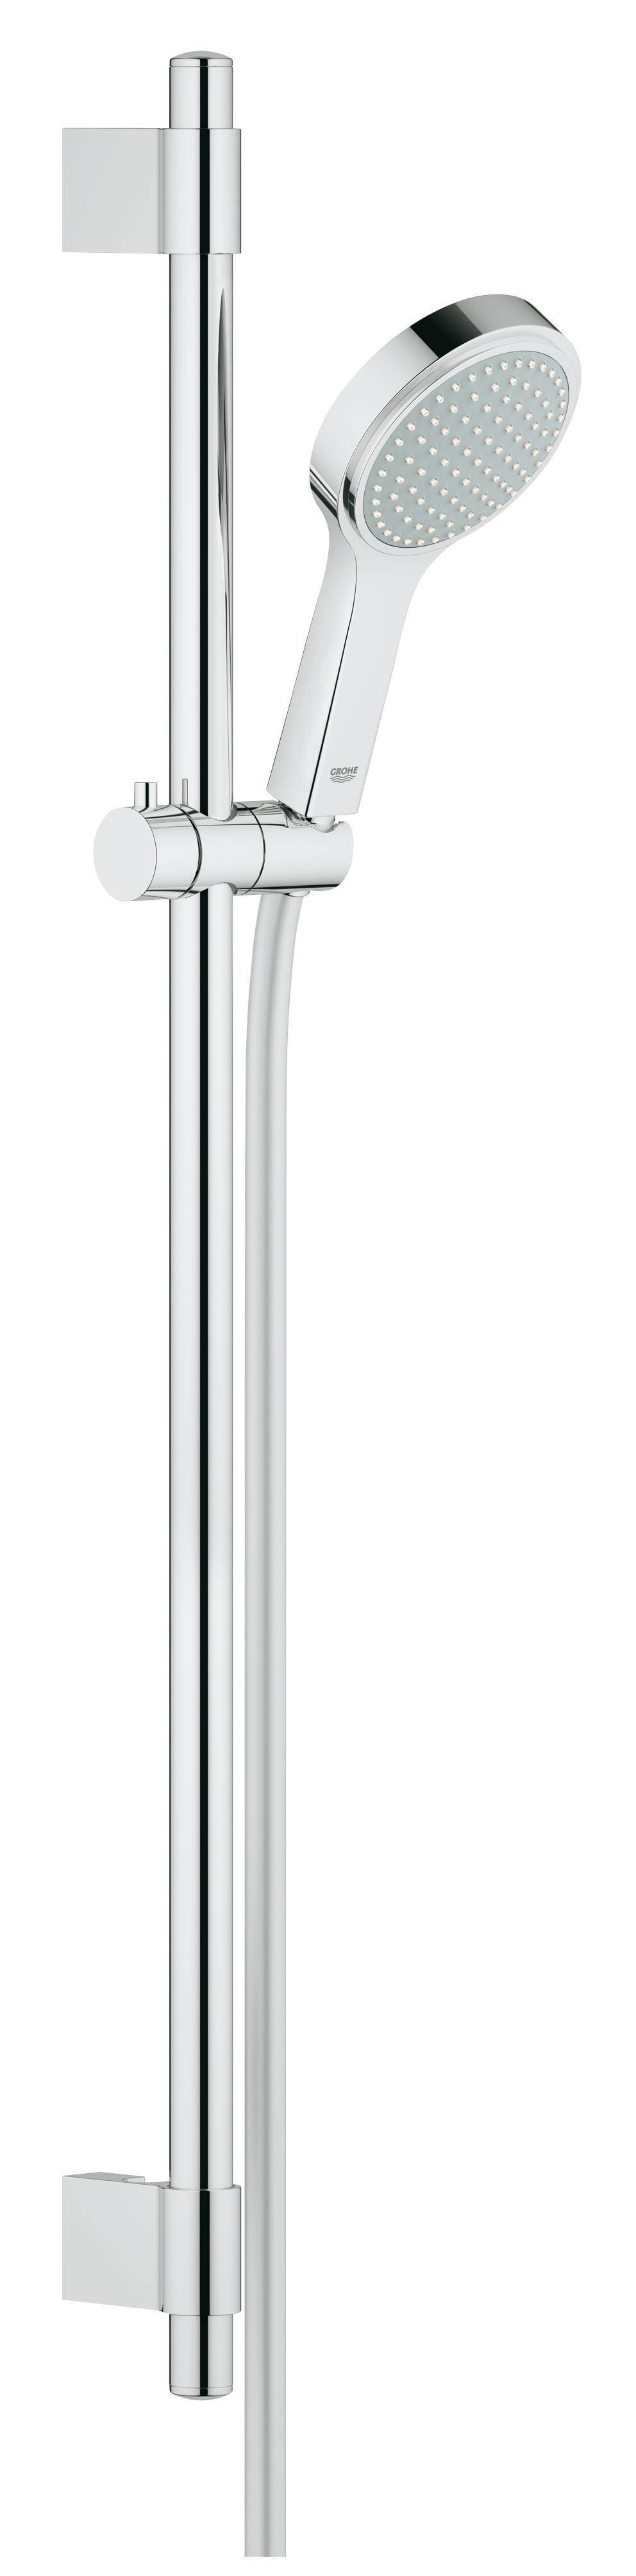 Душевой гарнитур Grohe 27755000 Power&Soul Cosmopolitan 115 (ручной душ, штанга 900 мм, шланг 1750 мм), хром